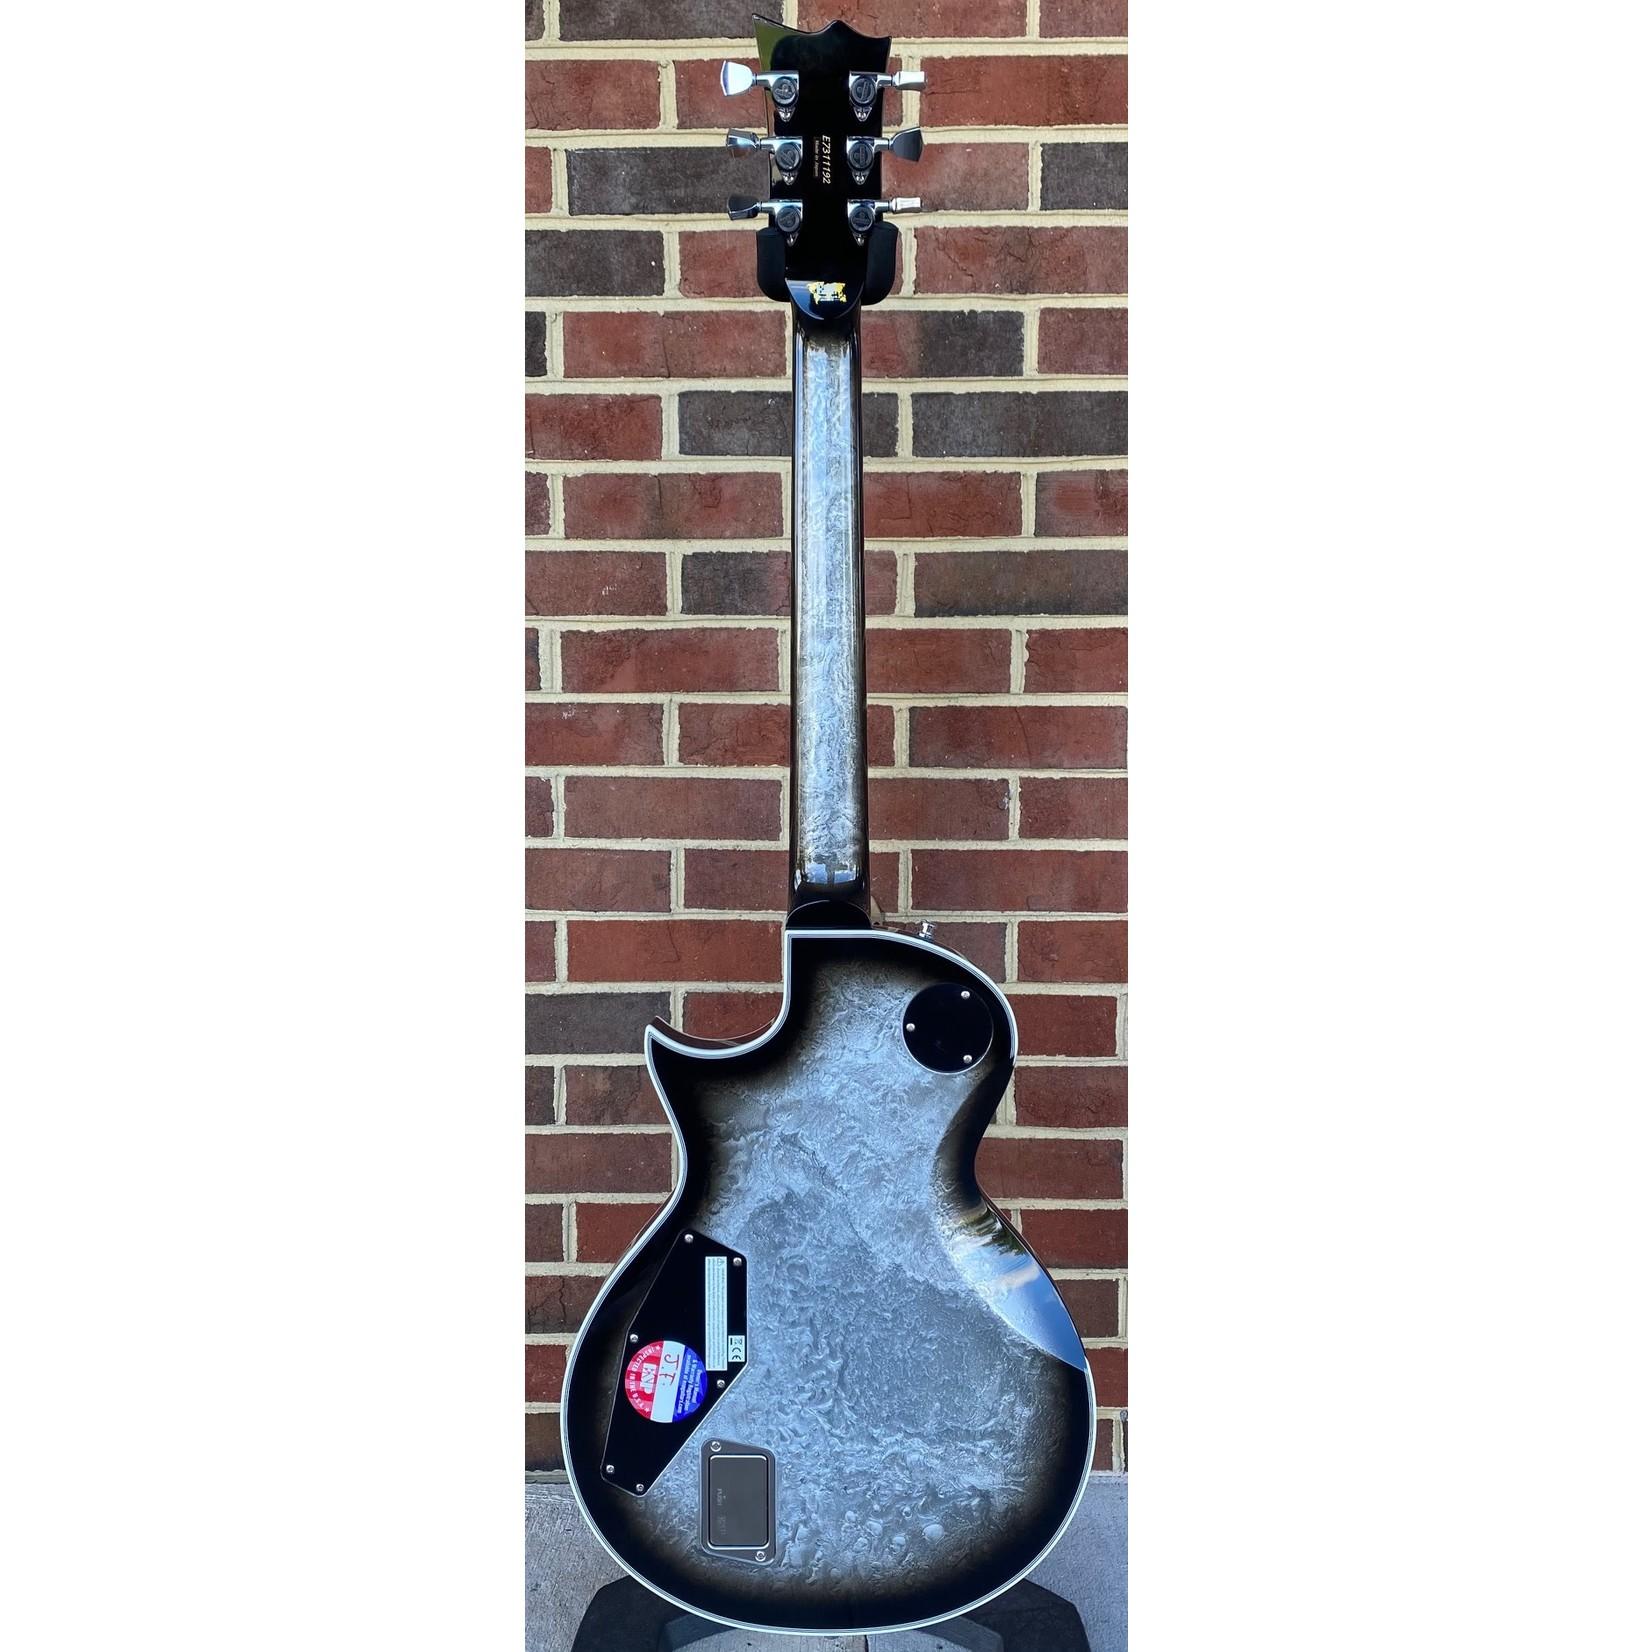 ESP ESP Original Eclipse Custom, Liquid Metal Silver Burst, EMG Het Set, Hardshell Case